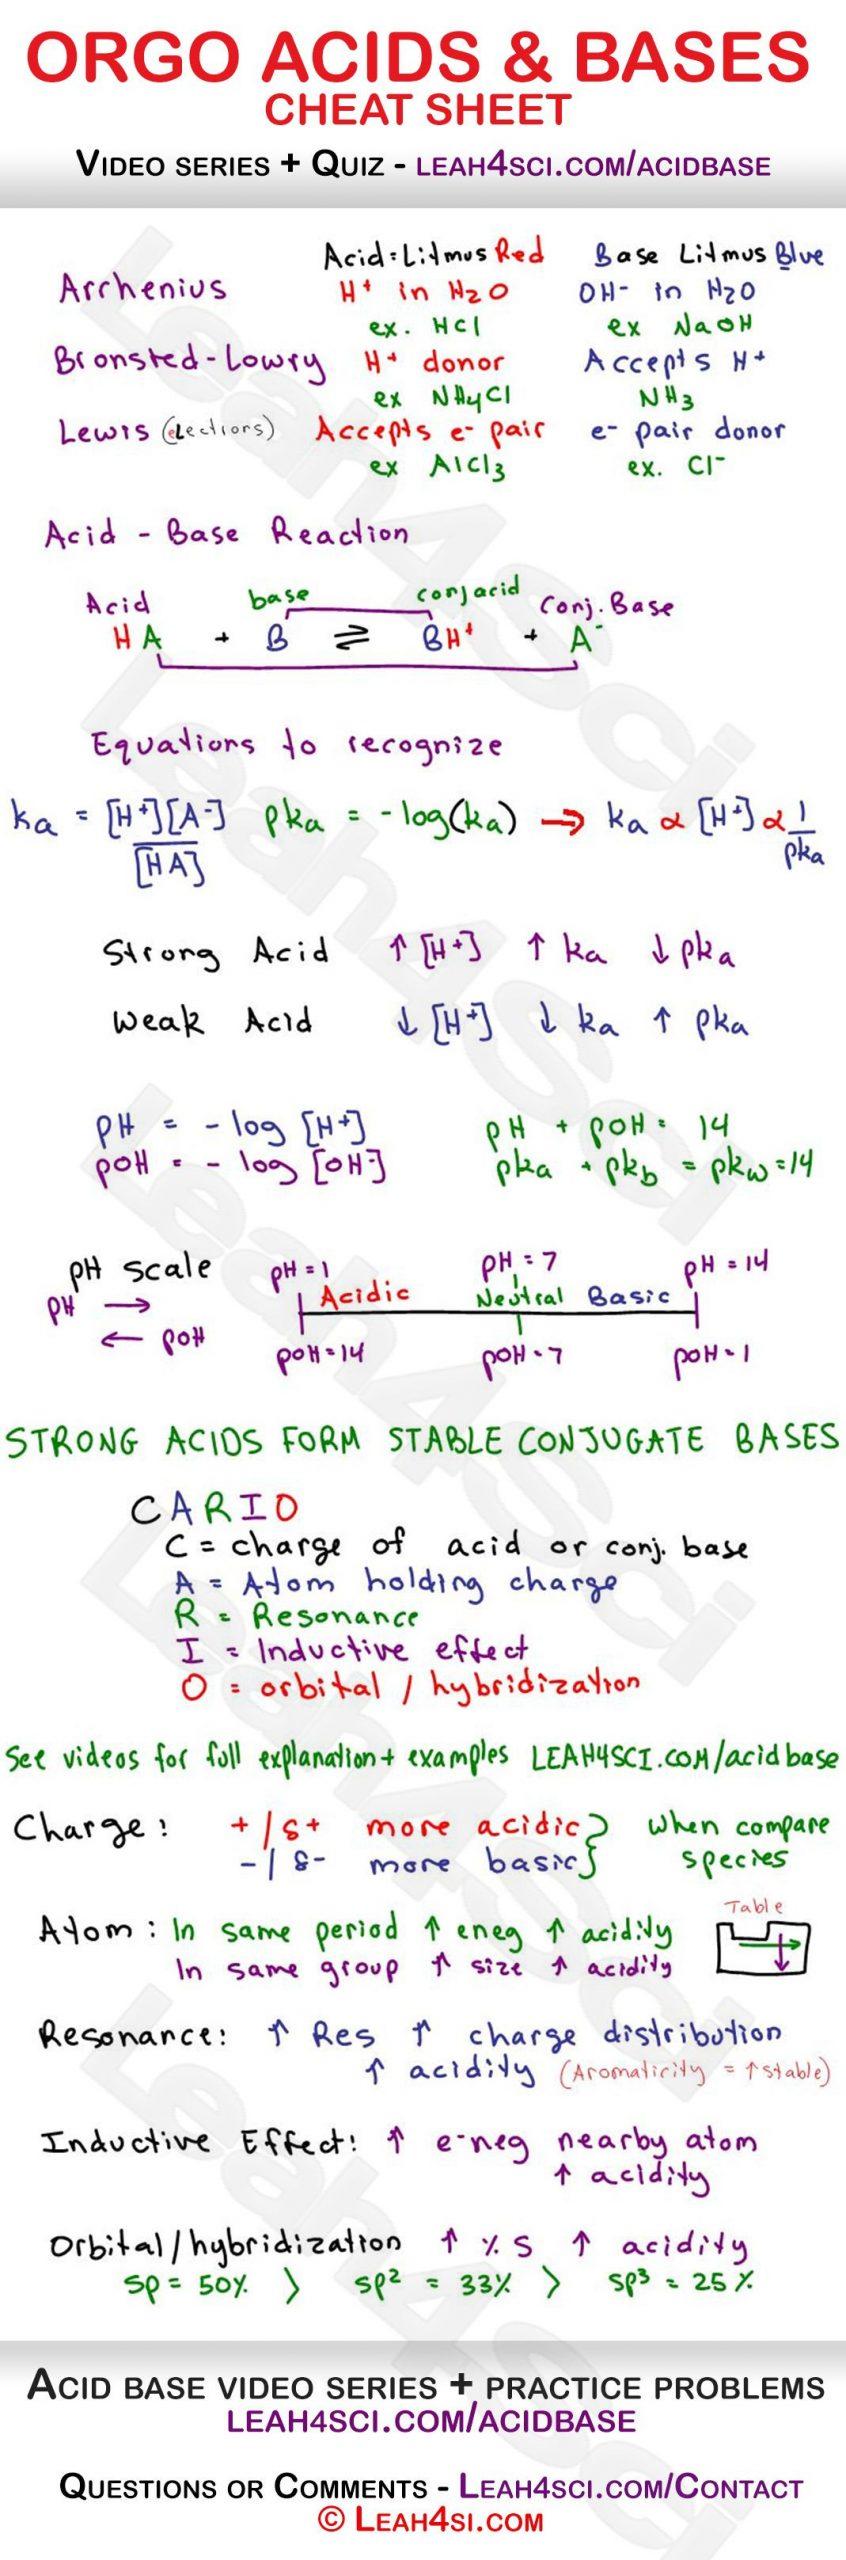 Acid and Bases Worksheet Answers Bronsted Lowry Acid Base Worksheet